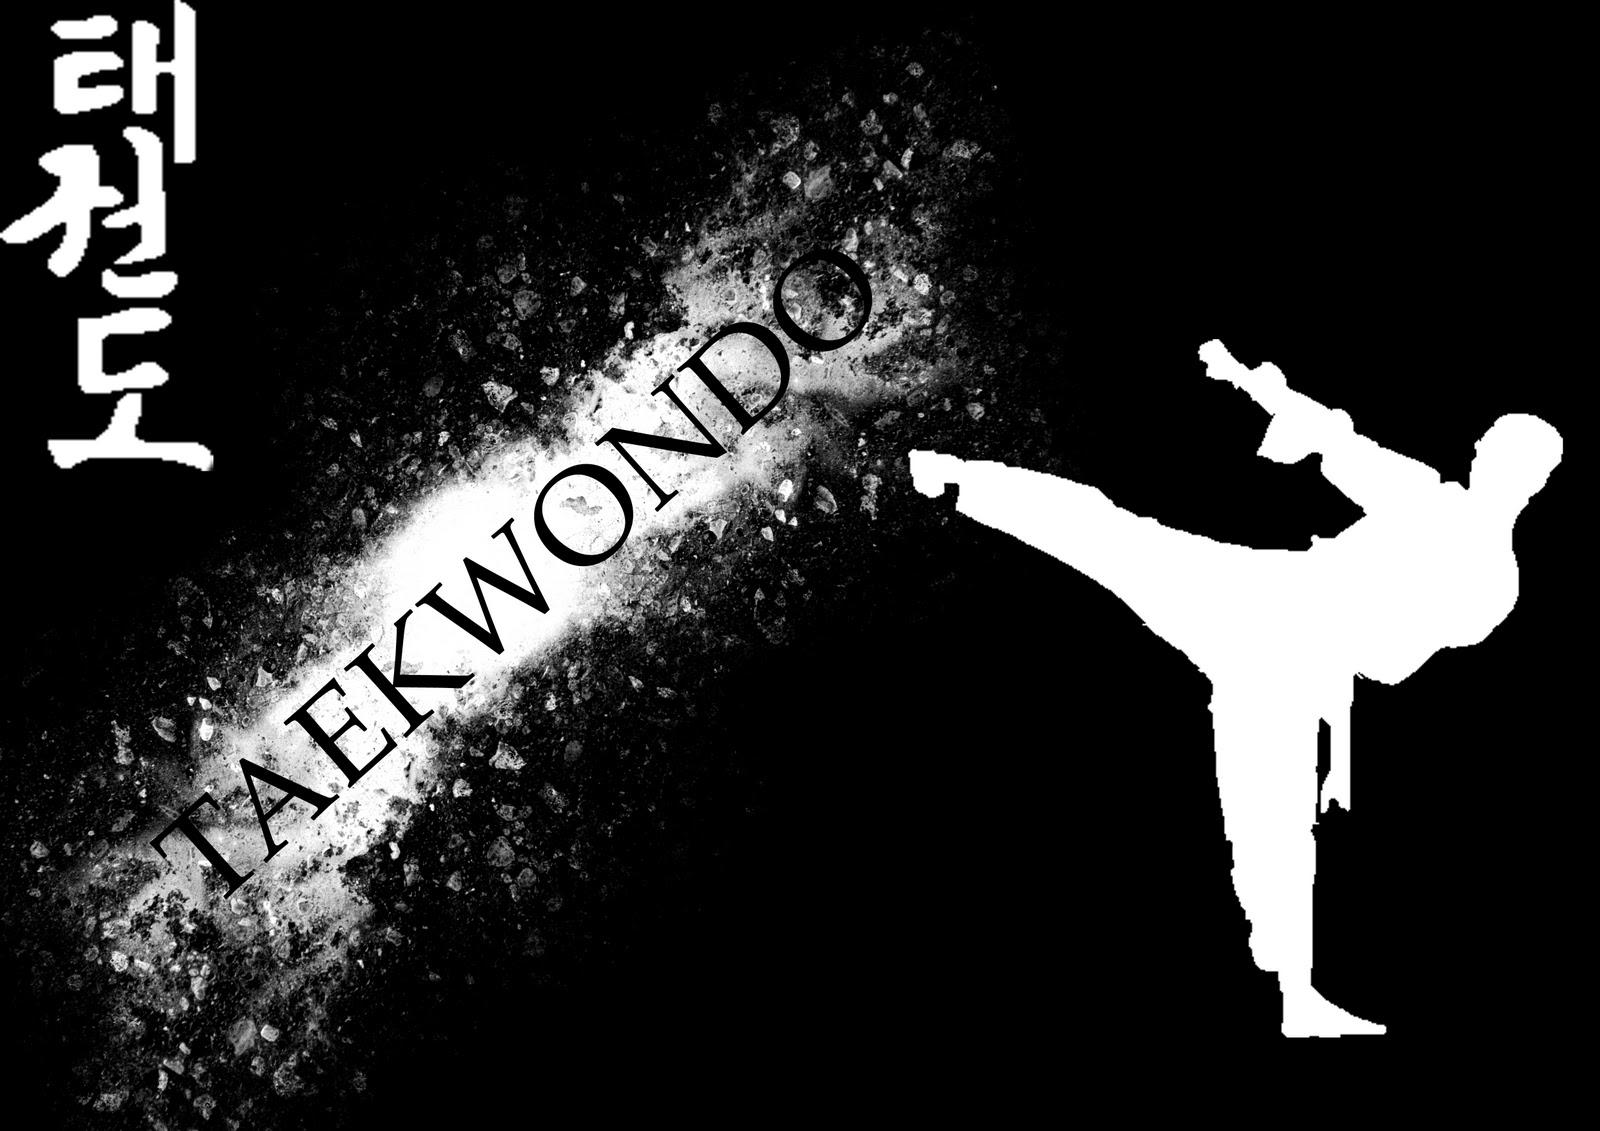 Pin Taekwondo wallpaper 1600x1131